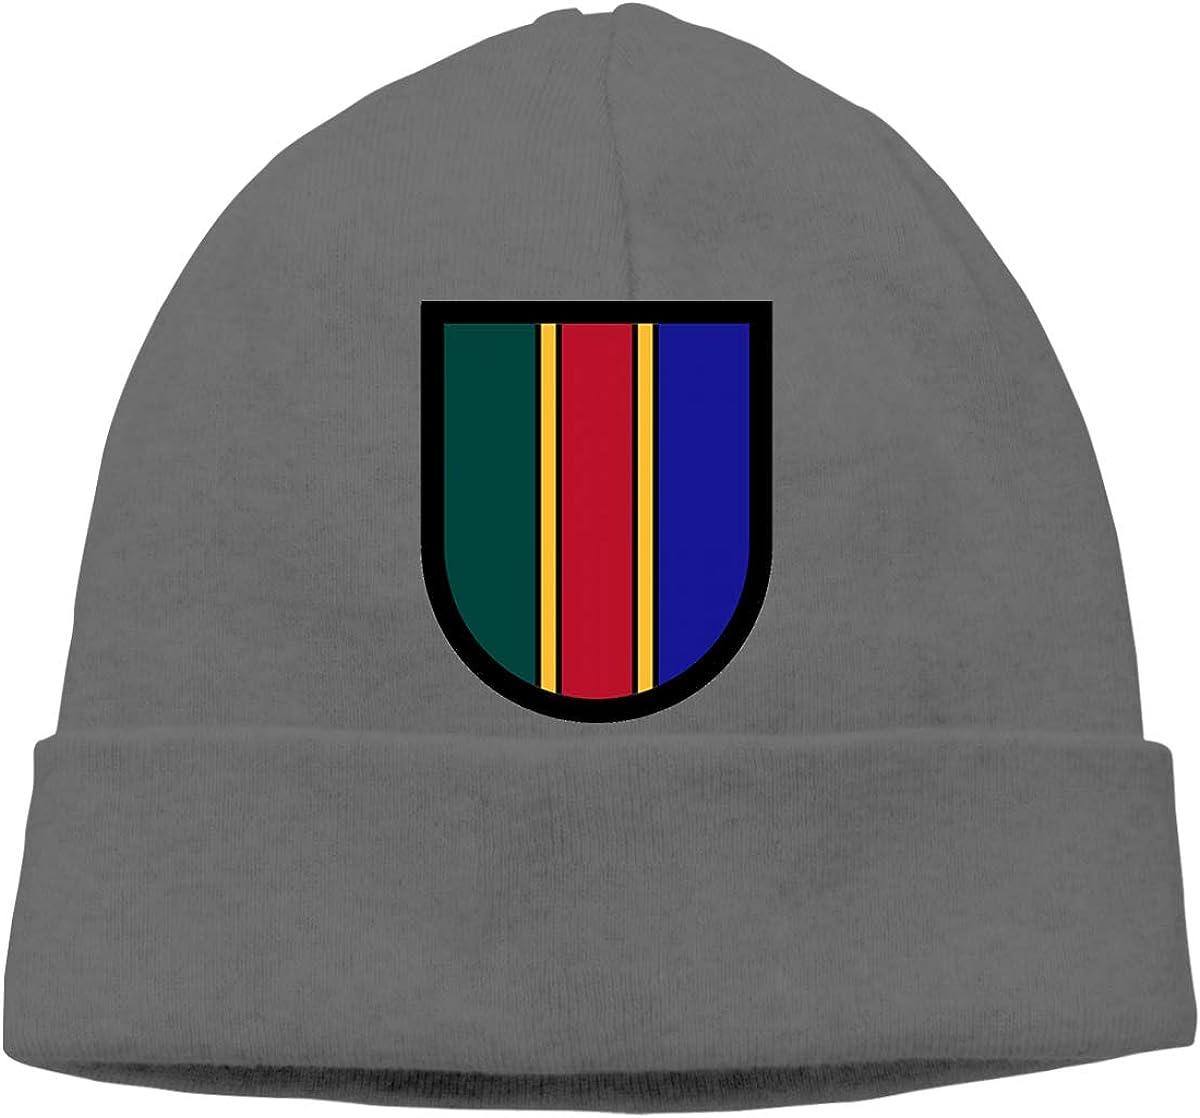 767th Ordnance Co Beret...